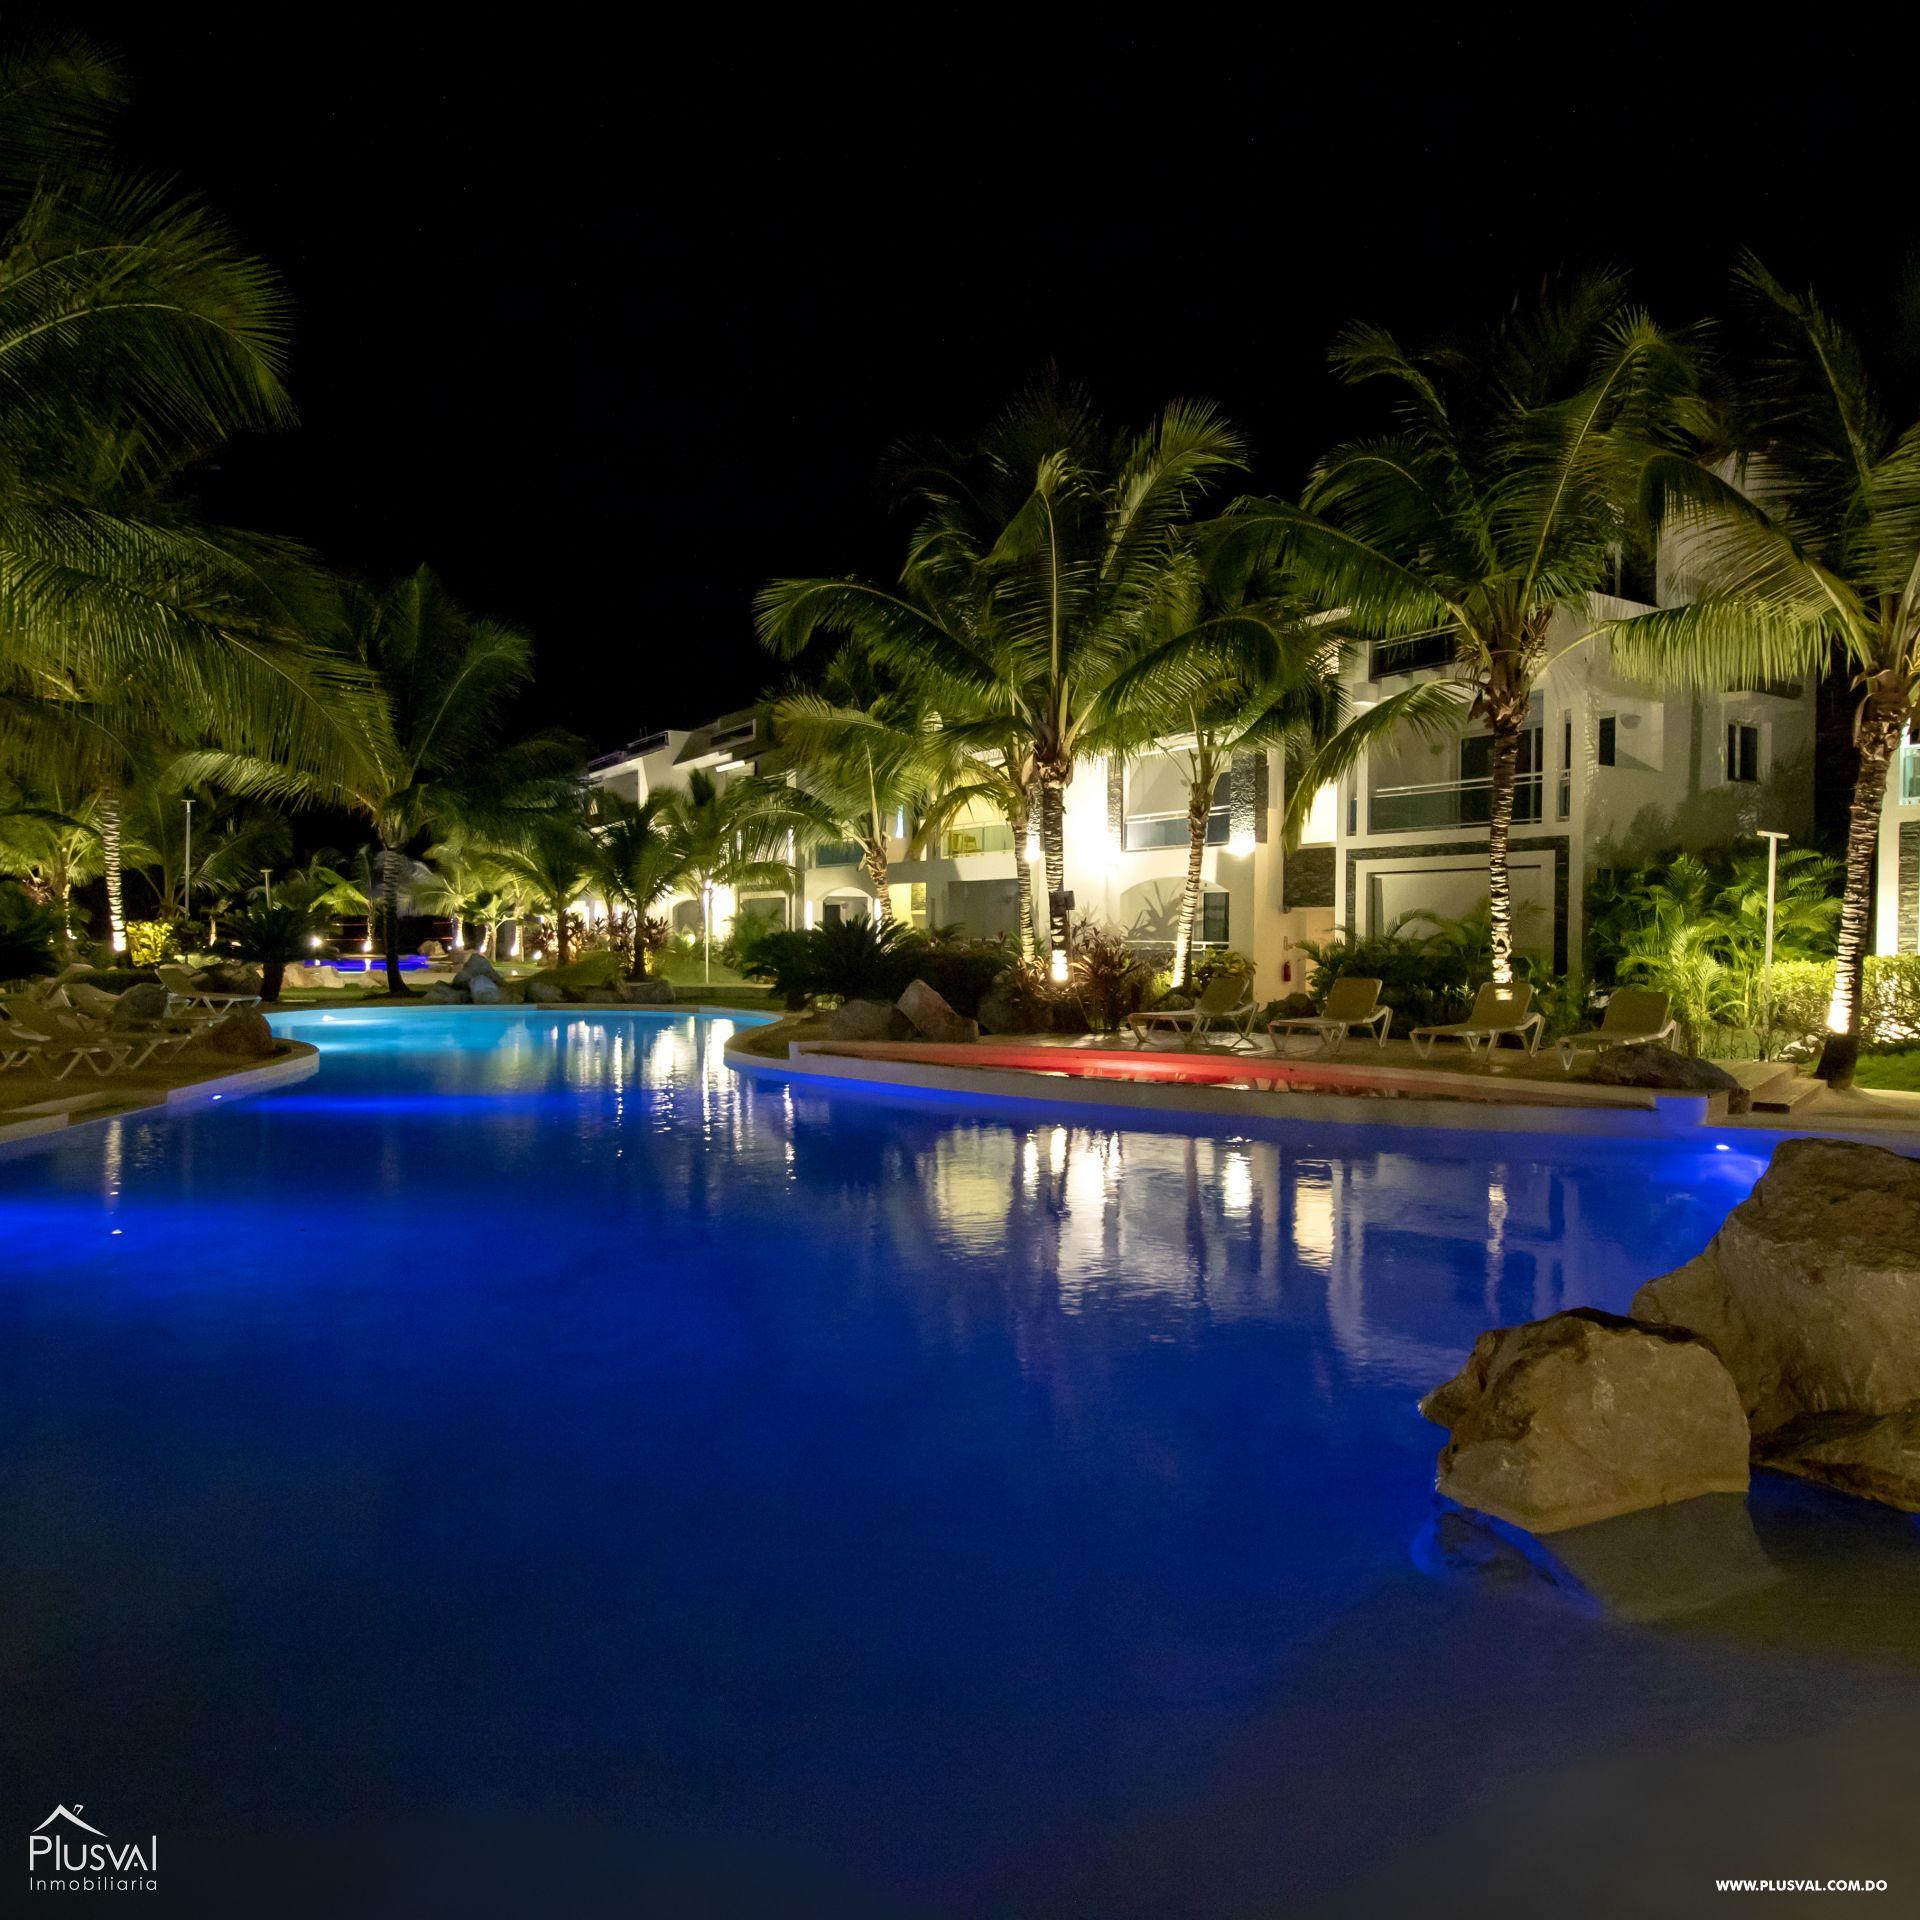 Penthouse en venta, cerca de la playa, Dominicus